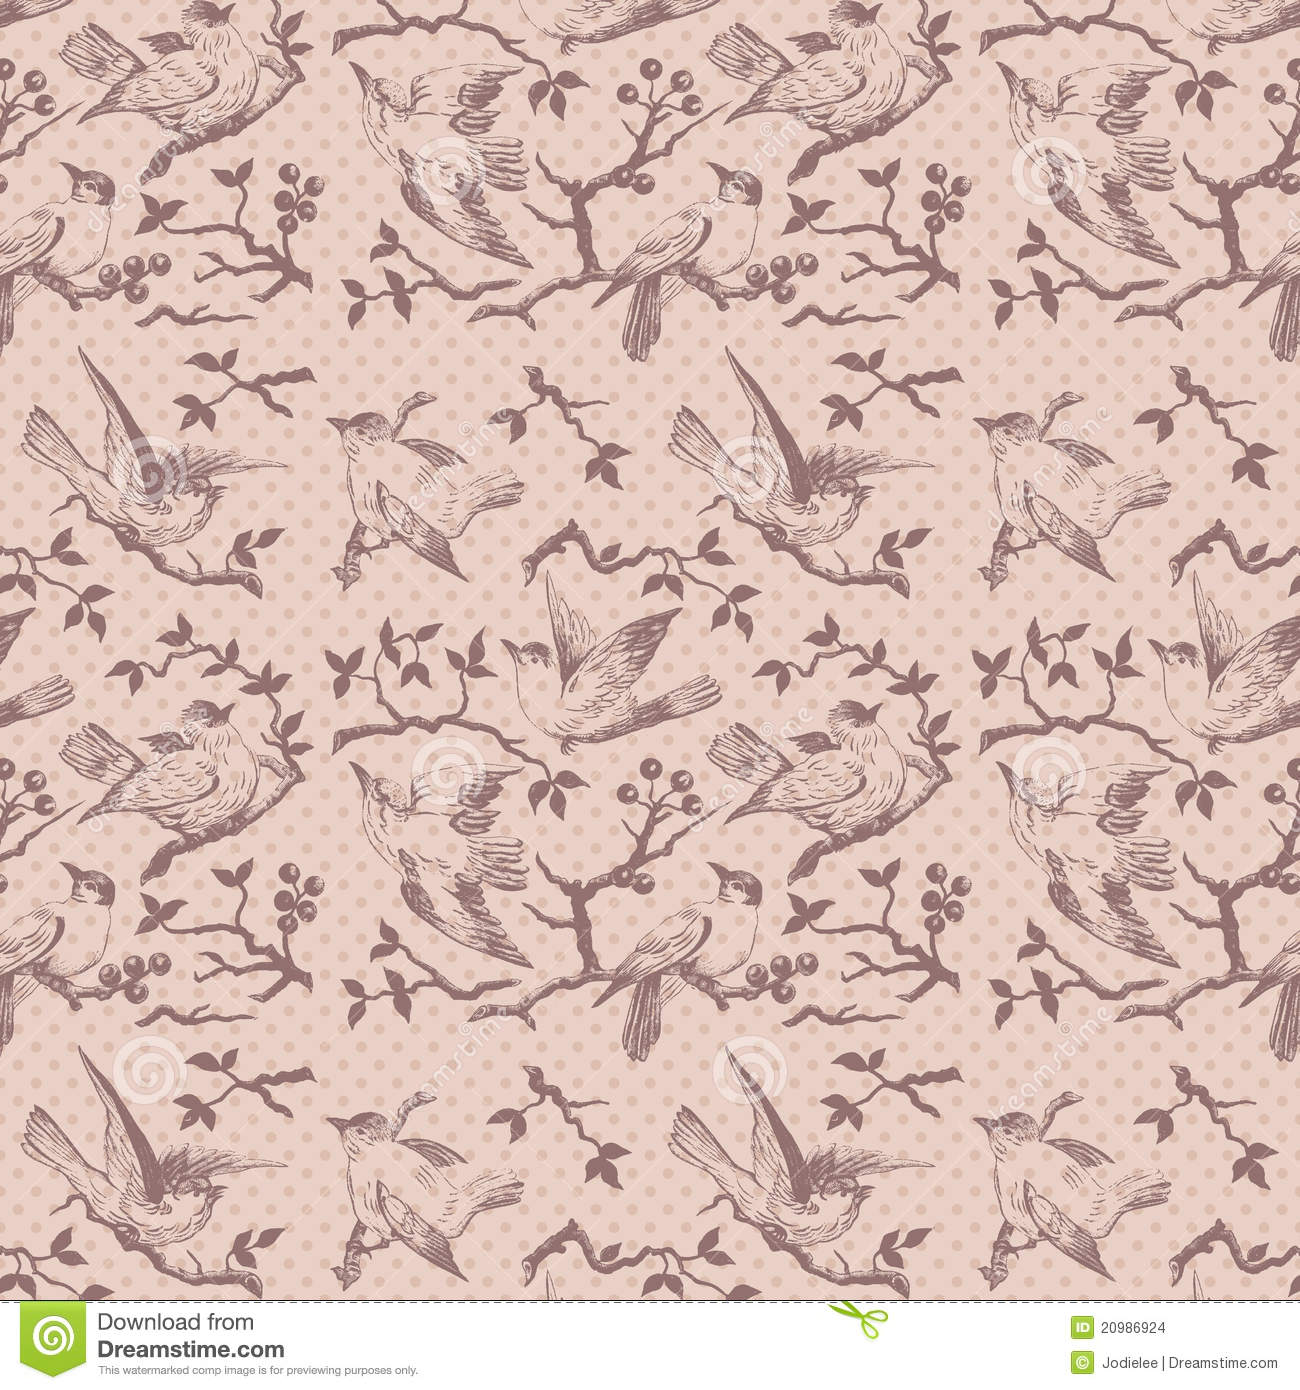 Vintage Bird Wallpaper Pattern Vintage bird seamless 1300x1390